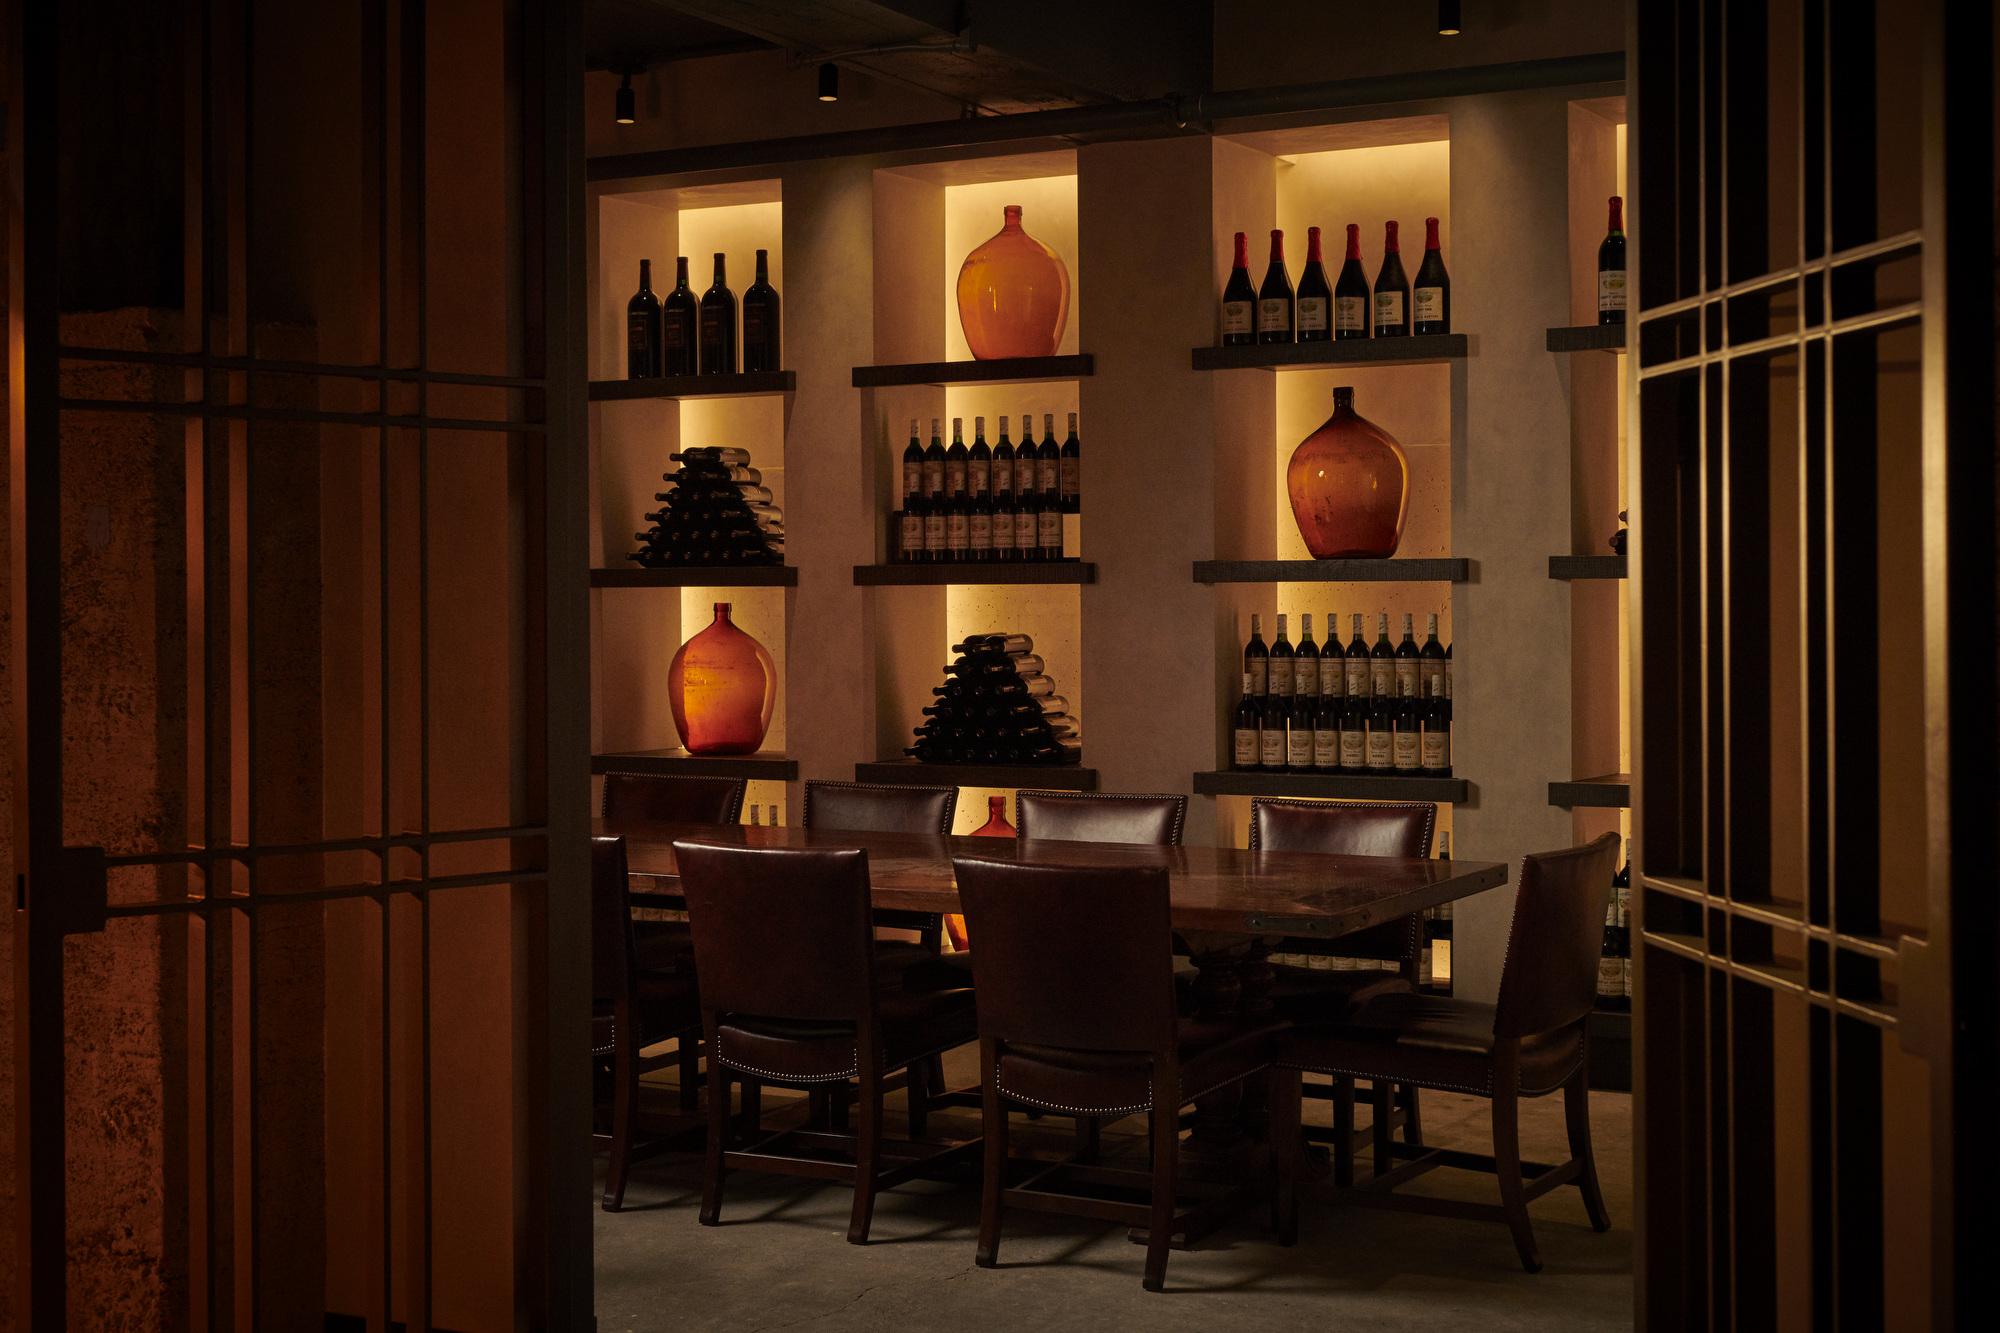 London_drinks_photographer_advertising_commercial_lifestyle-0007.JPG